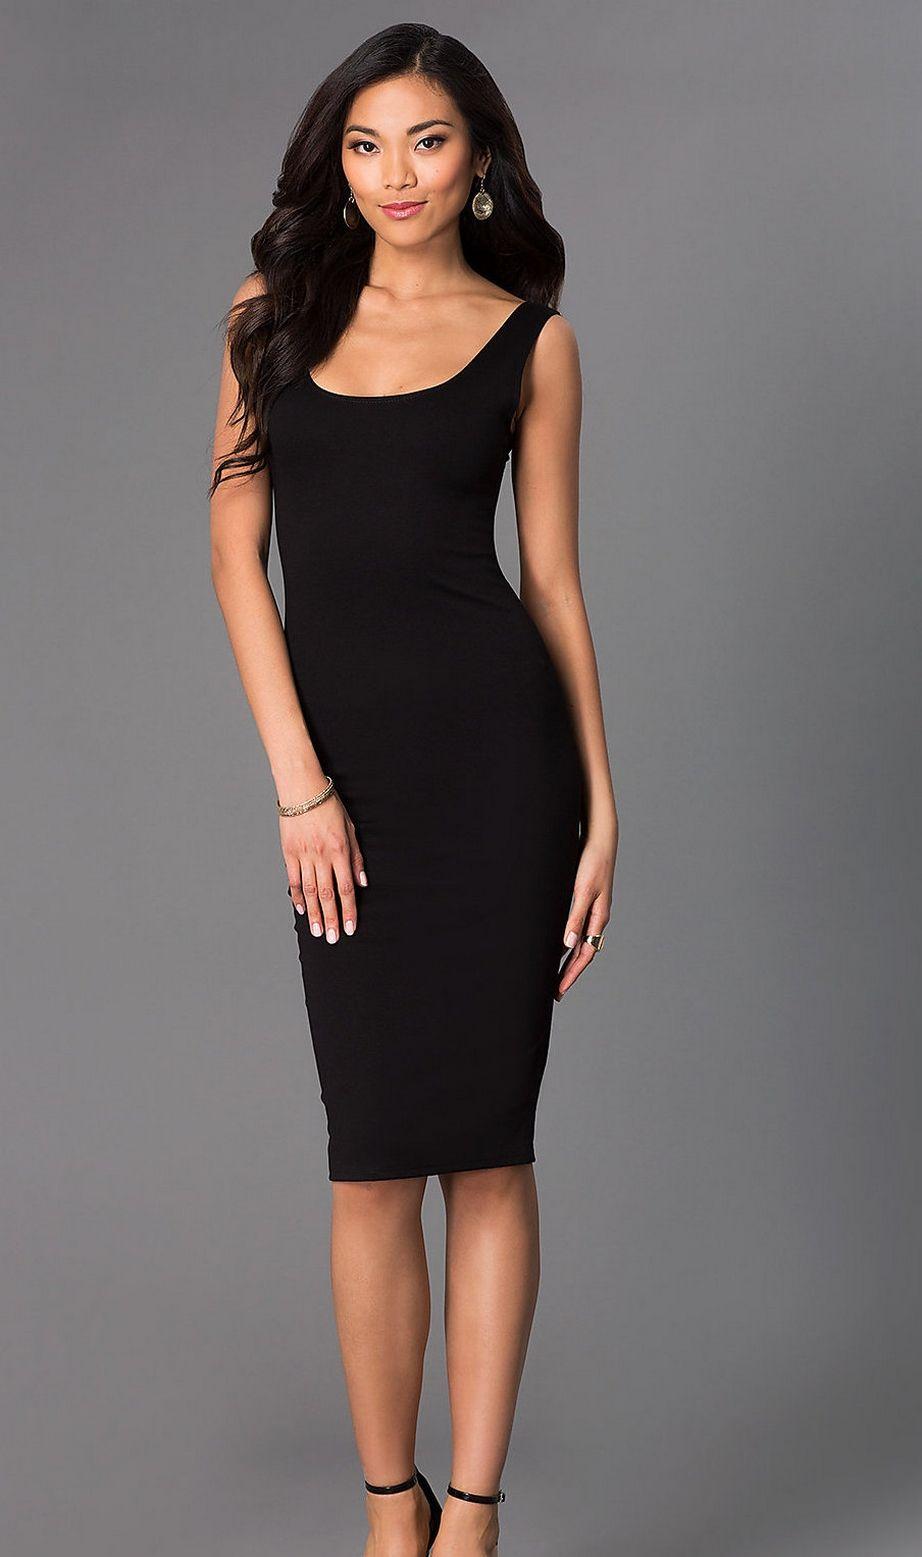 70 perfect time black mini little dress ideas tight